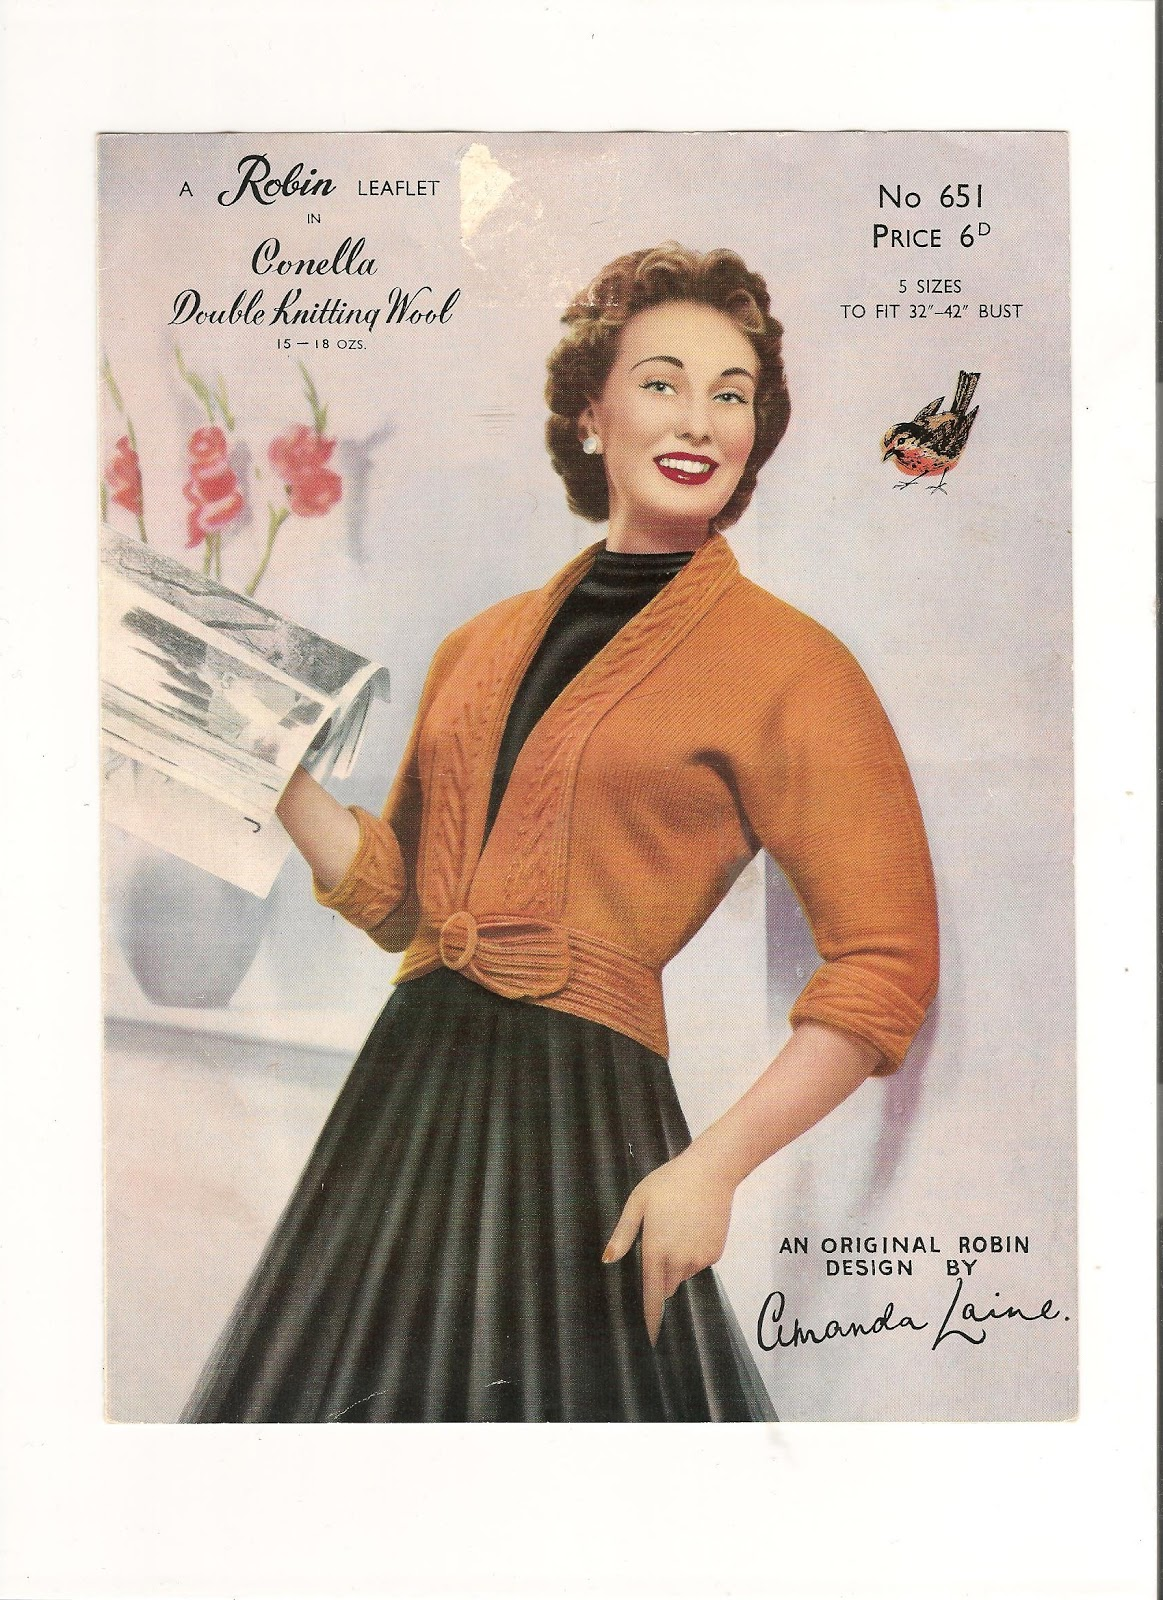 Free Vintage Knitting Patterns 1940s : Debrafide: Vintage Knitting Patterns styles from the 1940s to 1950s